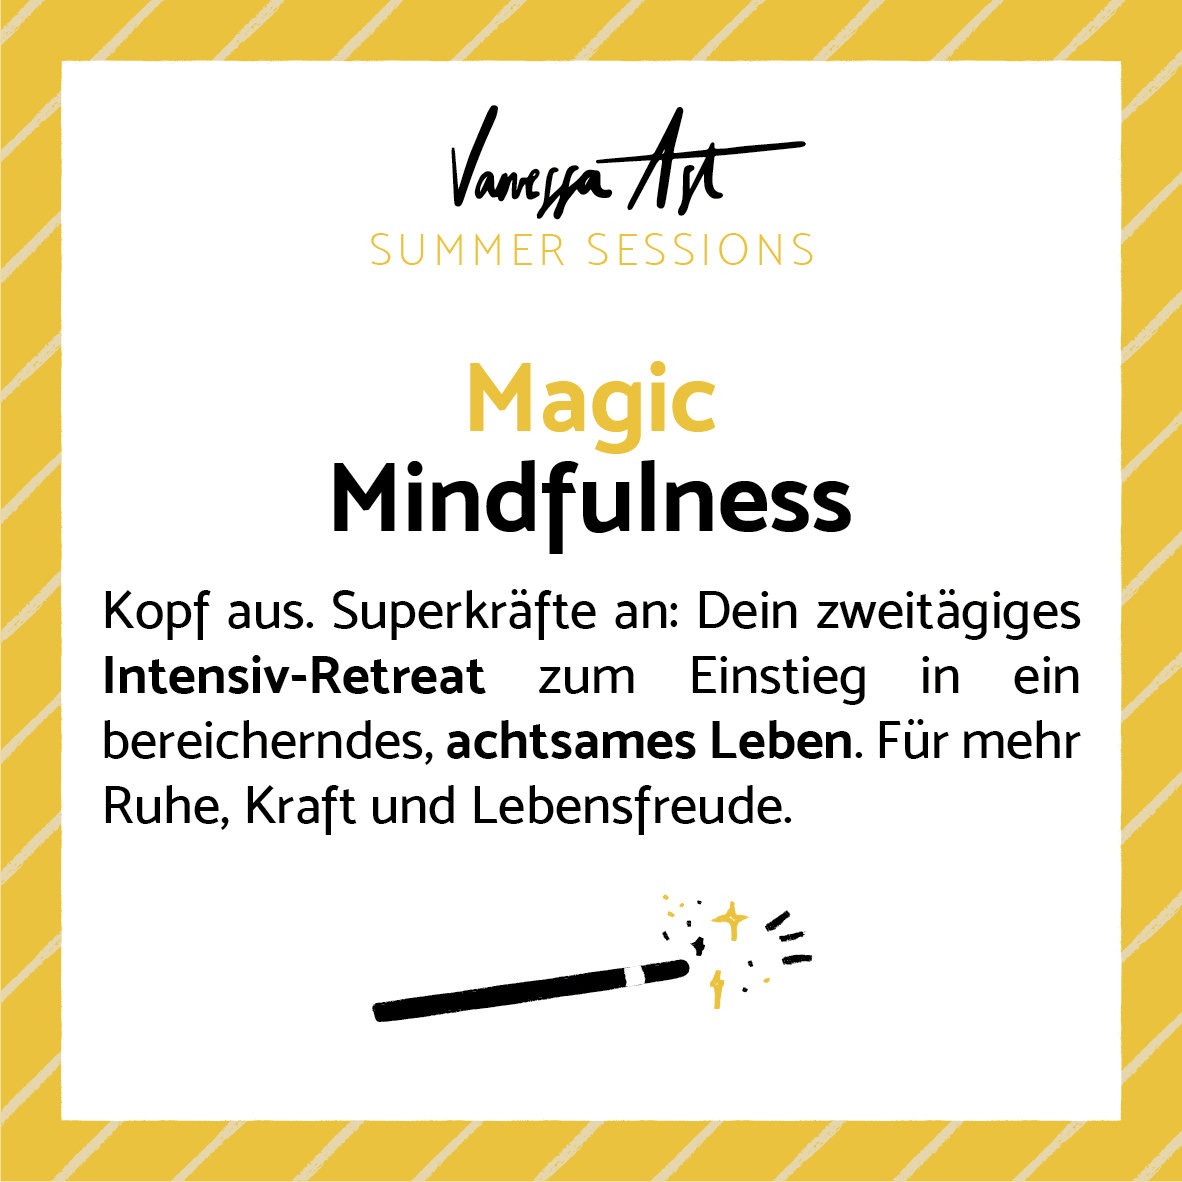 Magic Mindfulness (29. & 30. August)